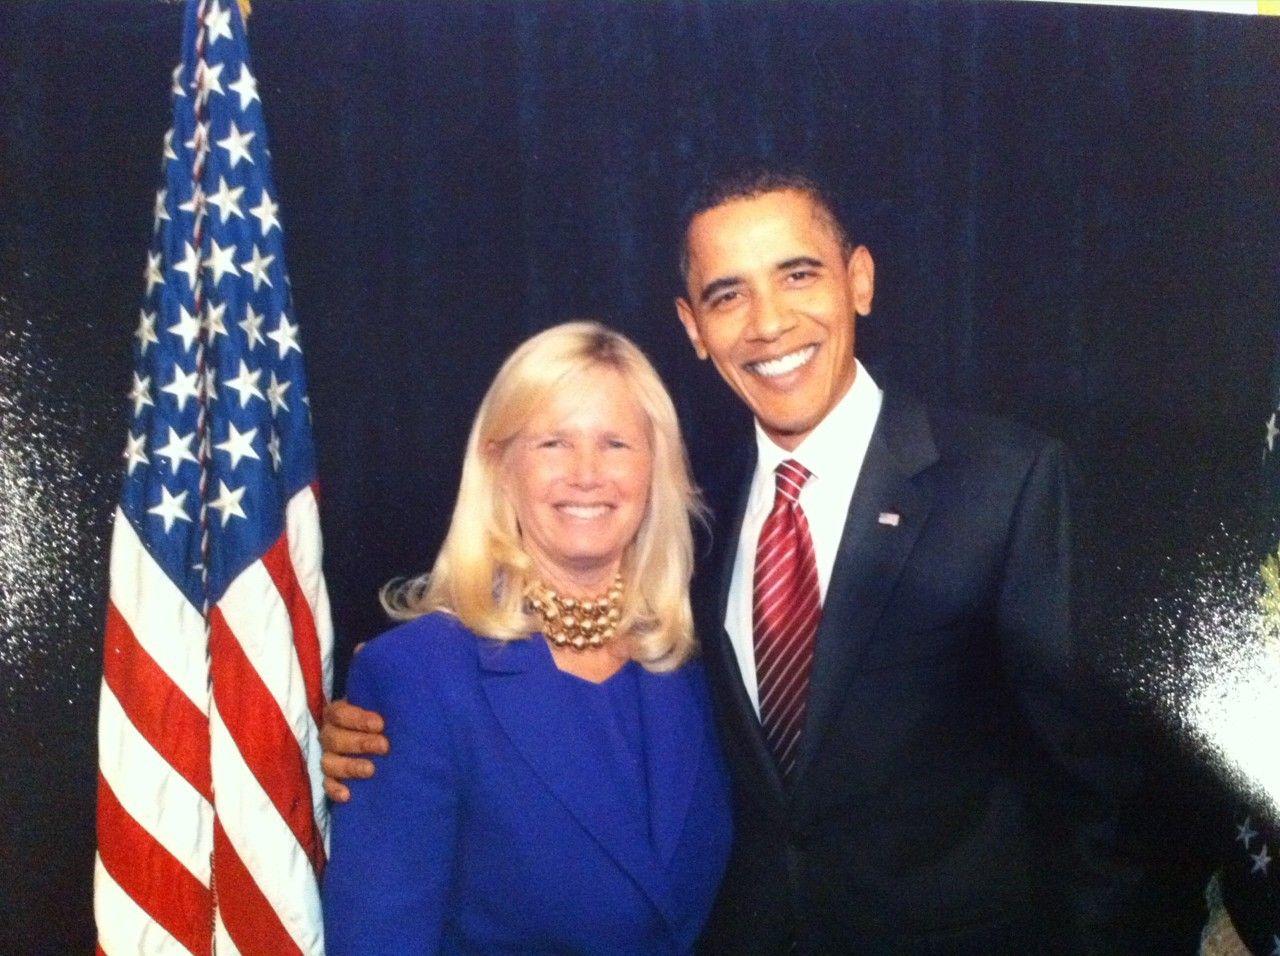 Rear Admiral Susan Blumenthal, M.D. with President Barack Obama